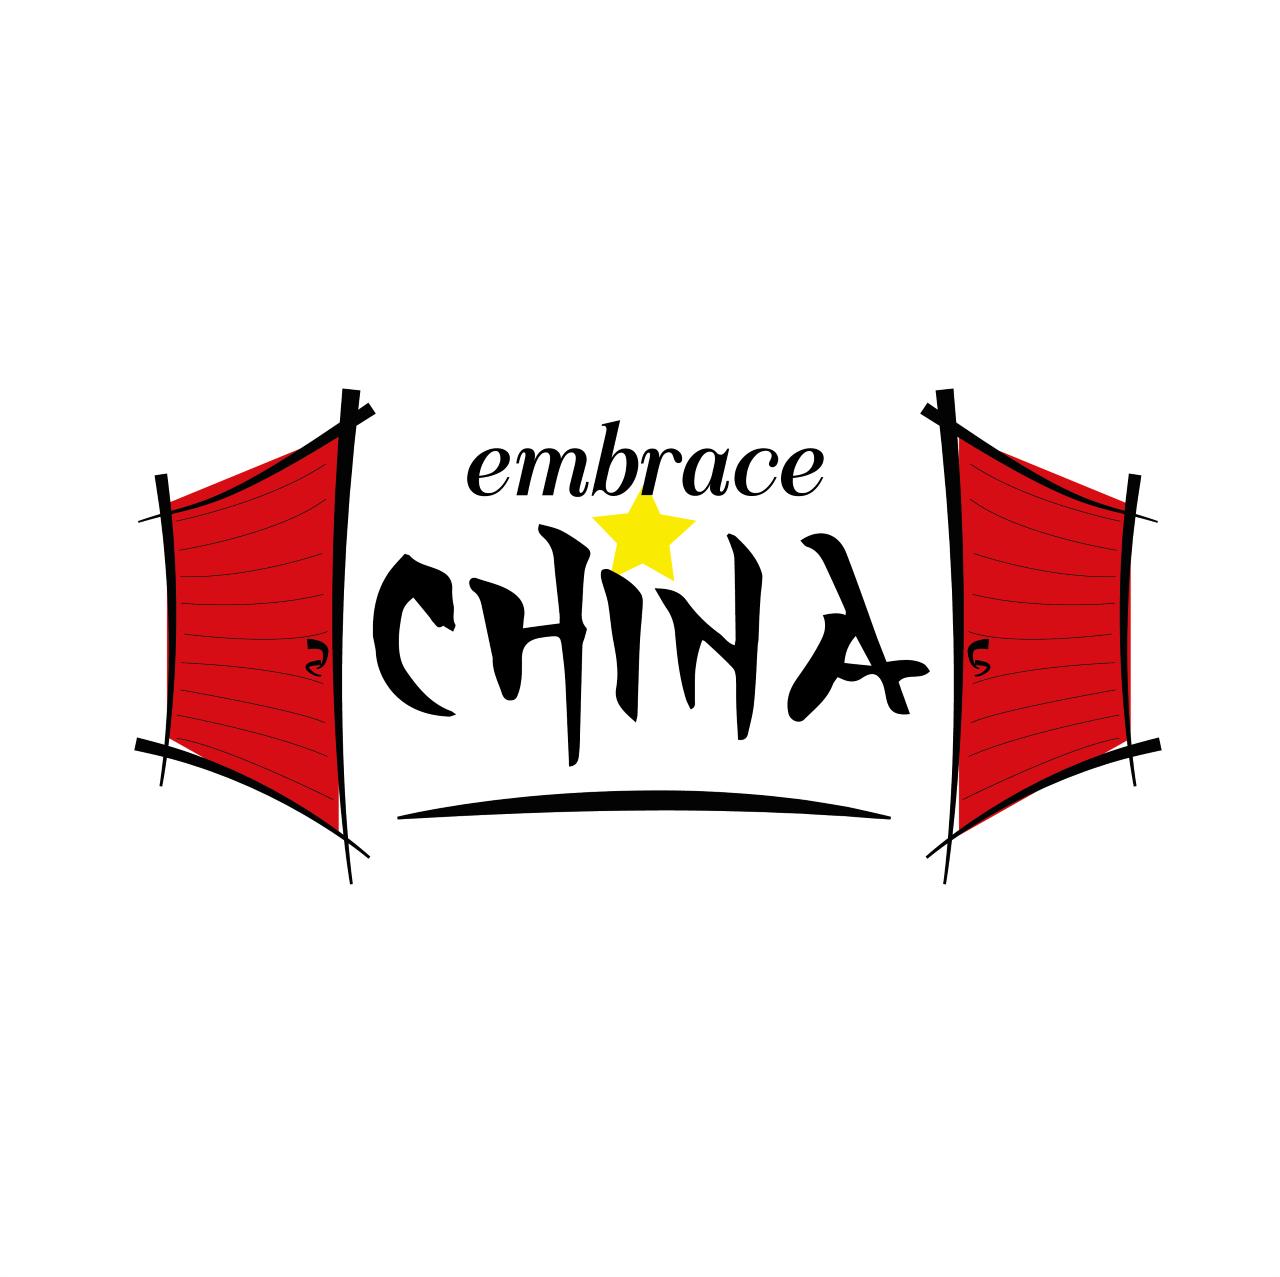 Embrace CHINA image